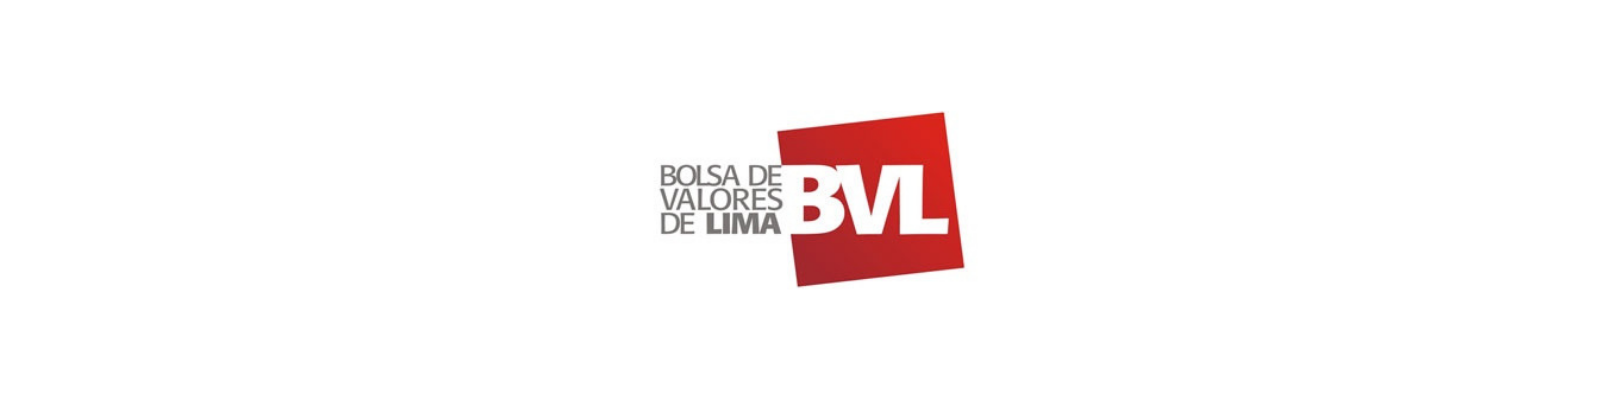 Como invertir en la Bolsa de Valores de Lima